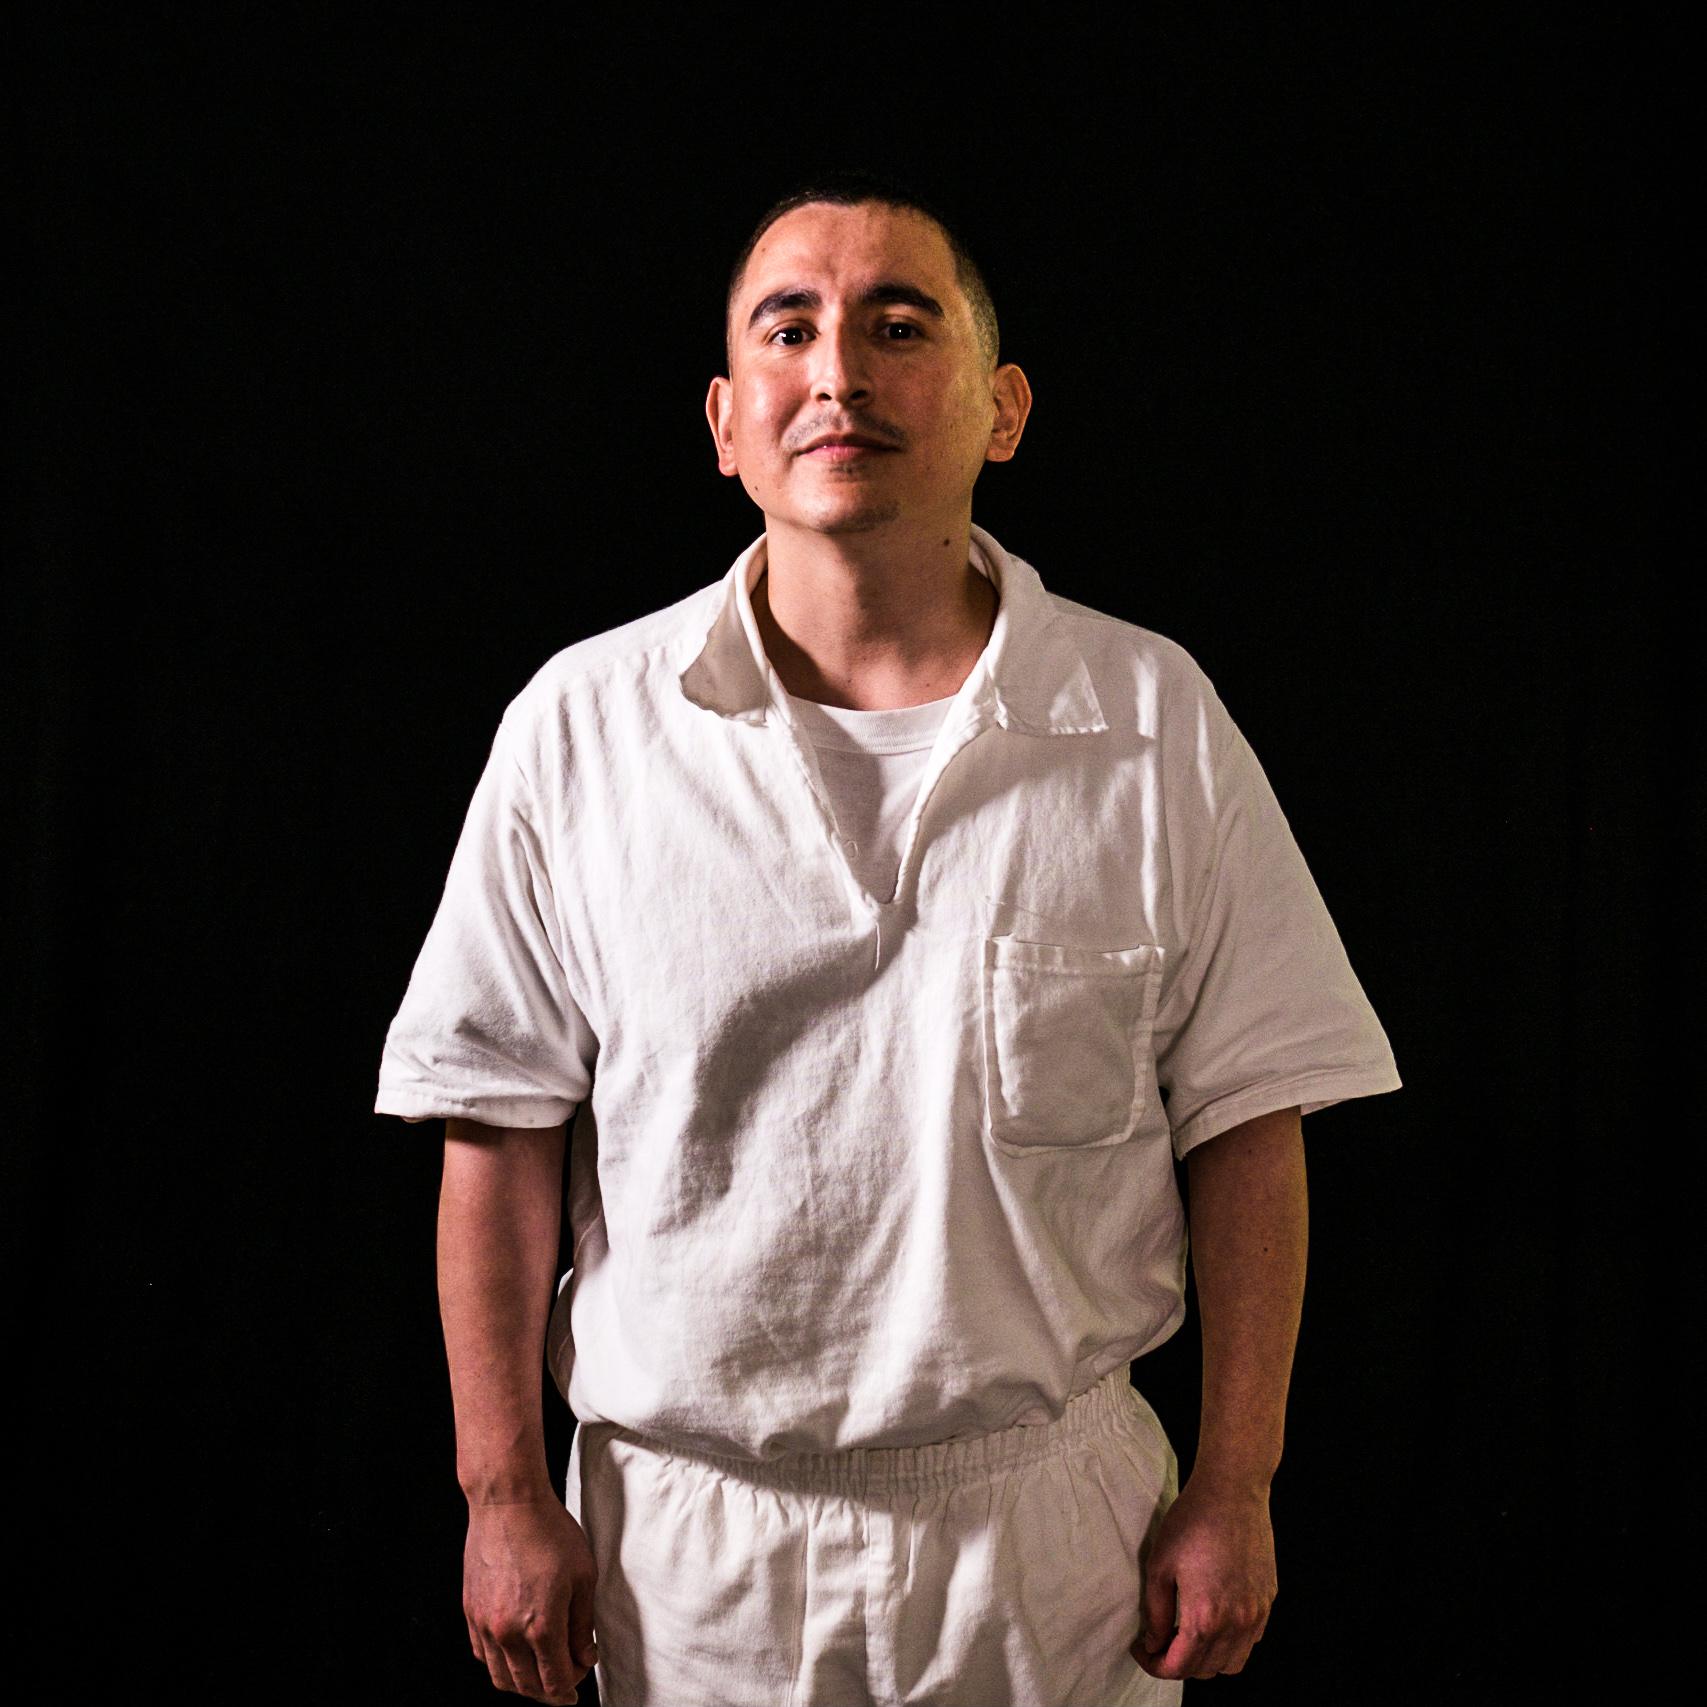 Daniel Jacob Herrera